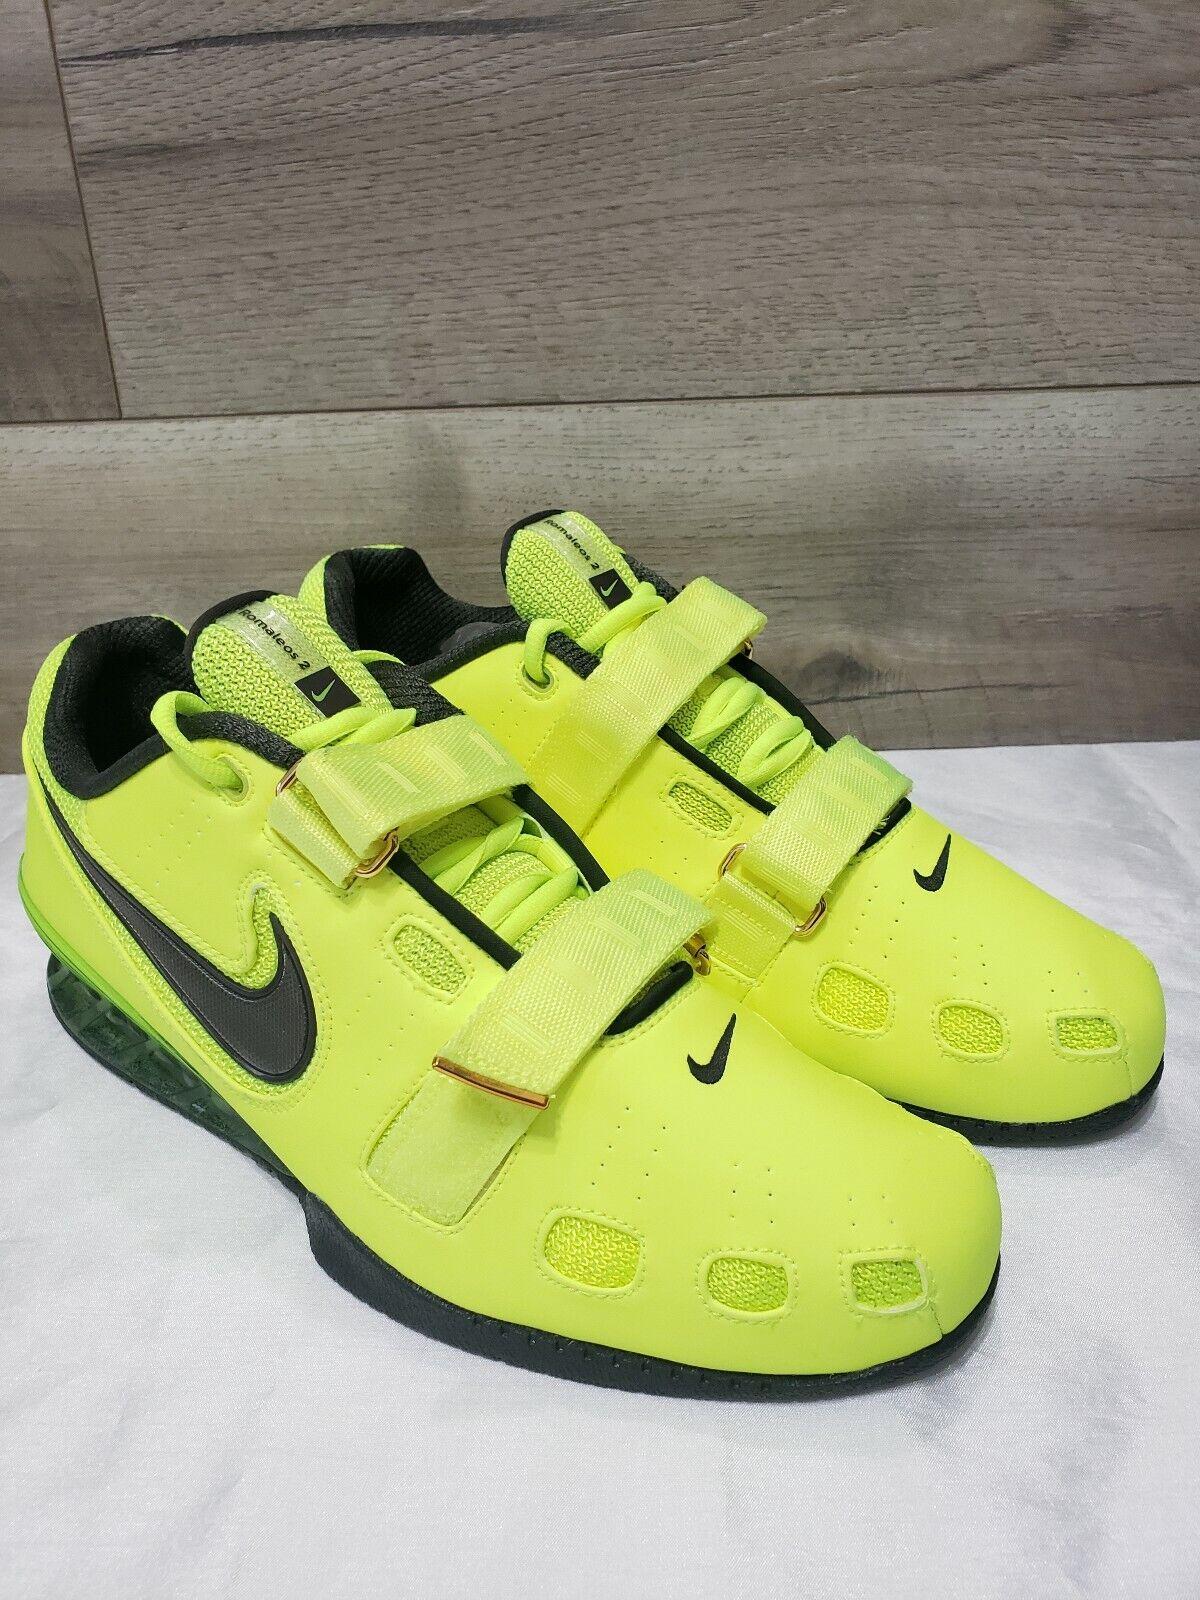 22030cb07407 ROMALEOS II 2 WEIGHTLIFTING TRAINING  476927 700  13 NIKE SHOES  nzaryo2323-Athletic Shoes